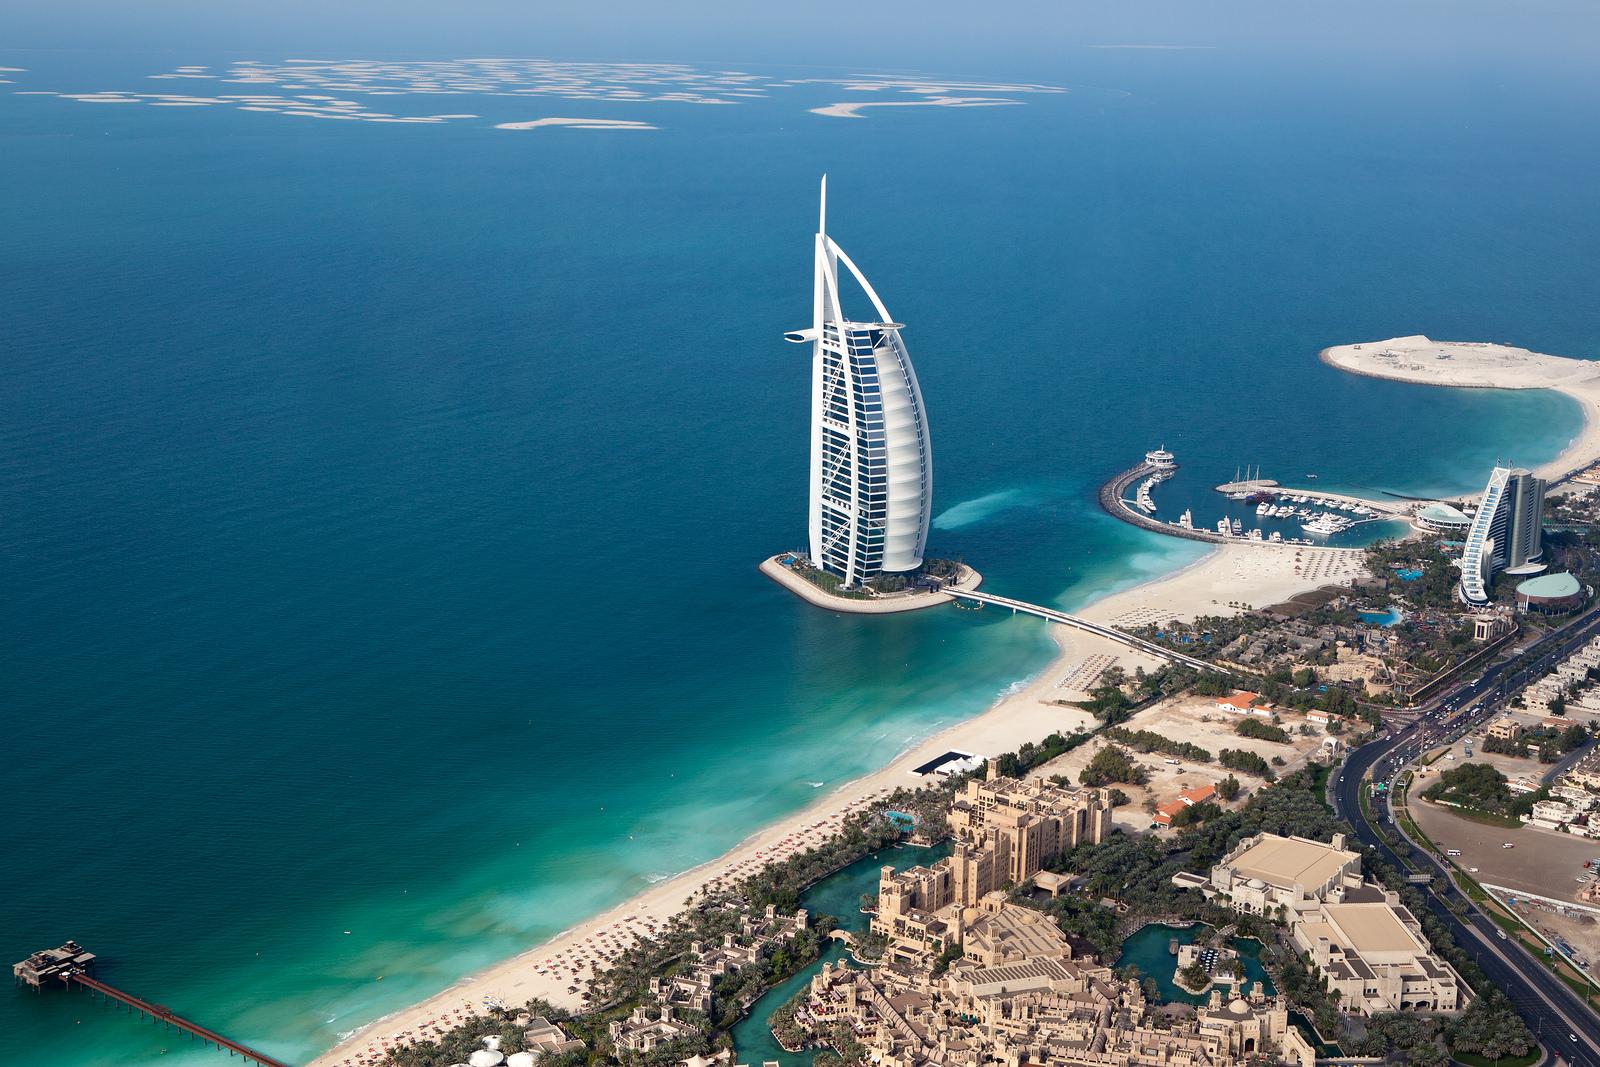 Dubai hotellit - Burj Al Arab: dubai 7 tähden hotelli helikopterista